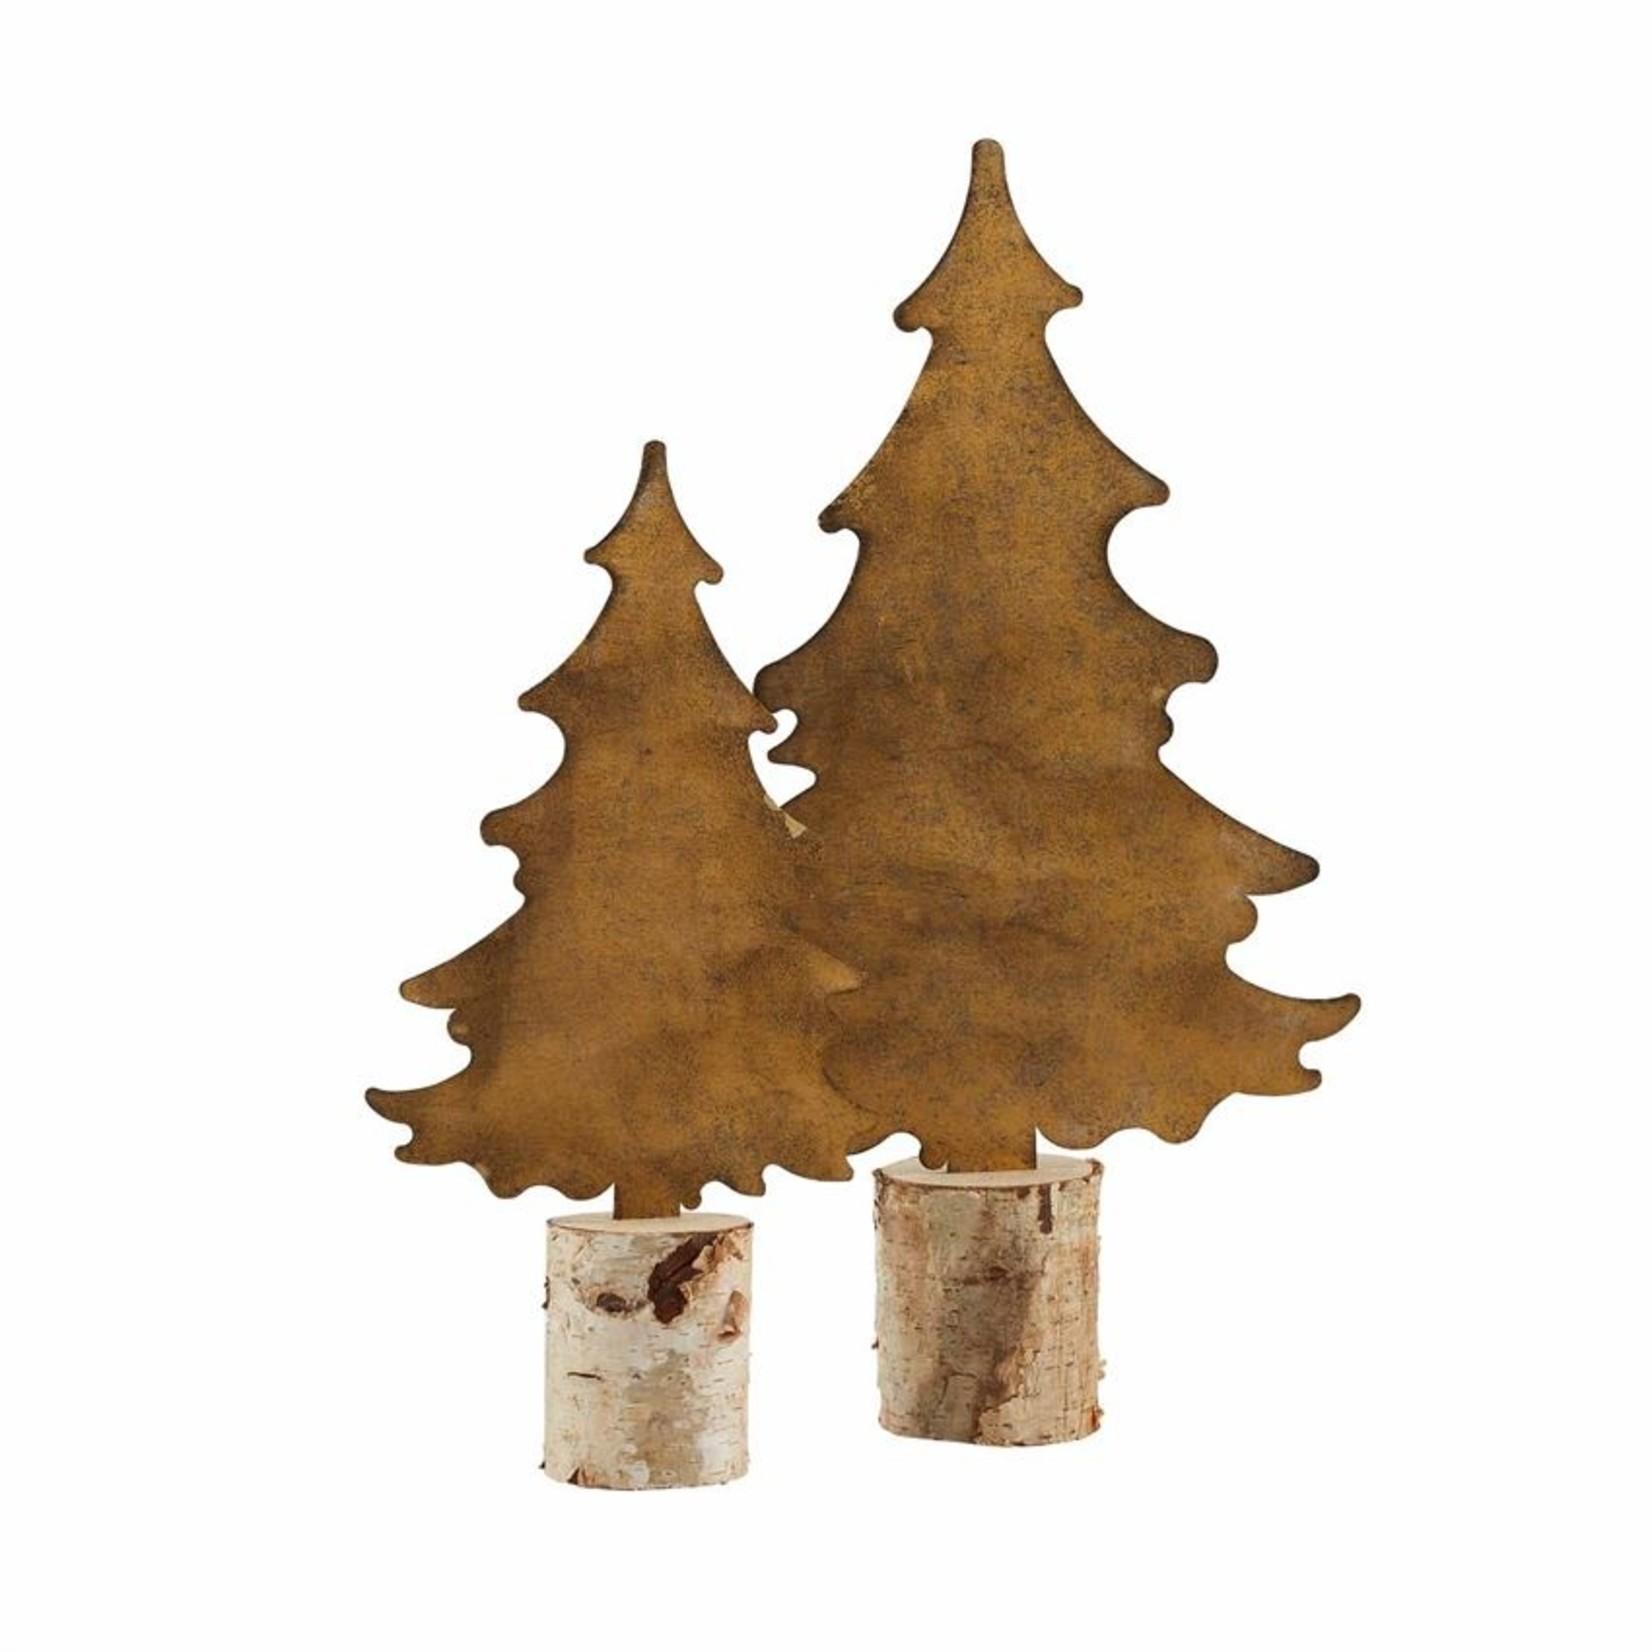 Mud Pie Birch Stem Trees